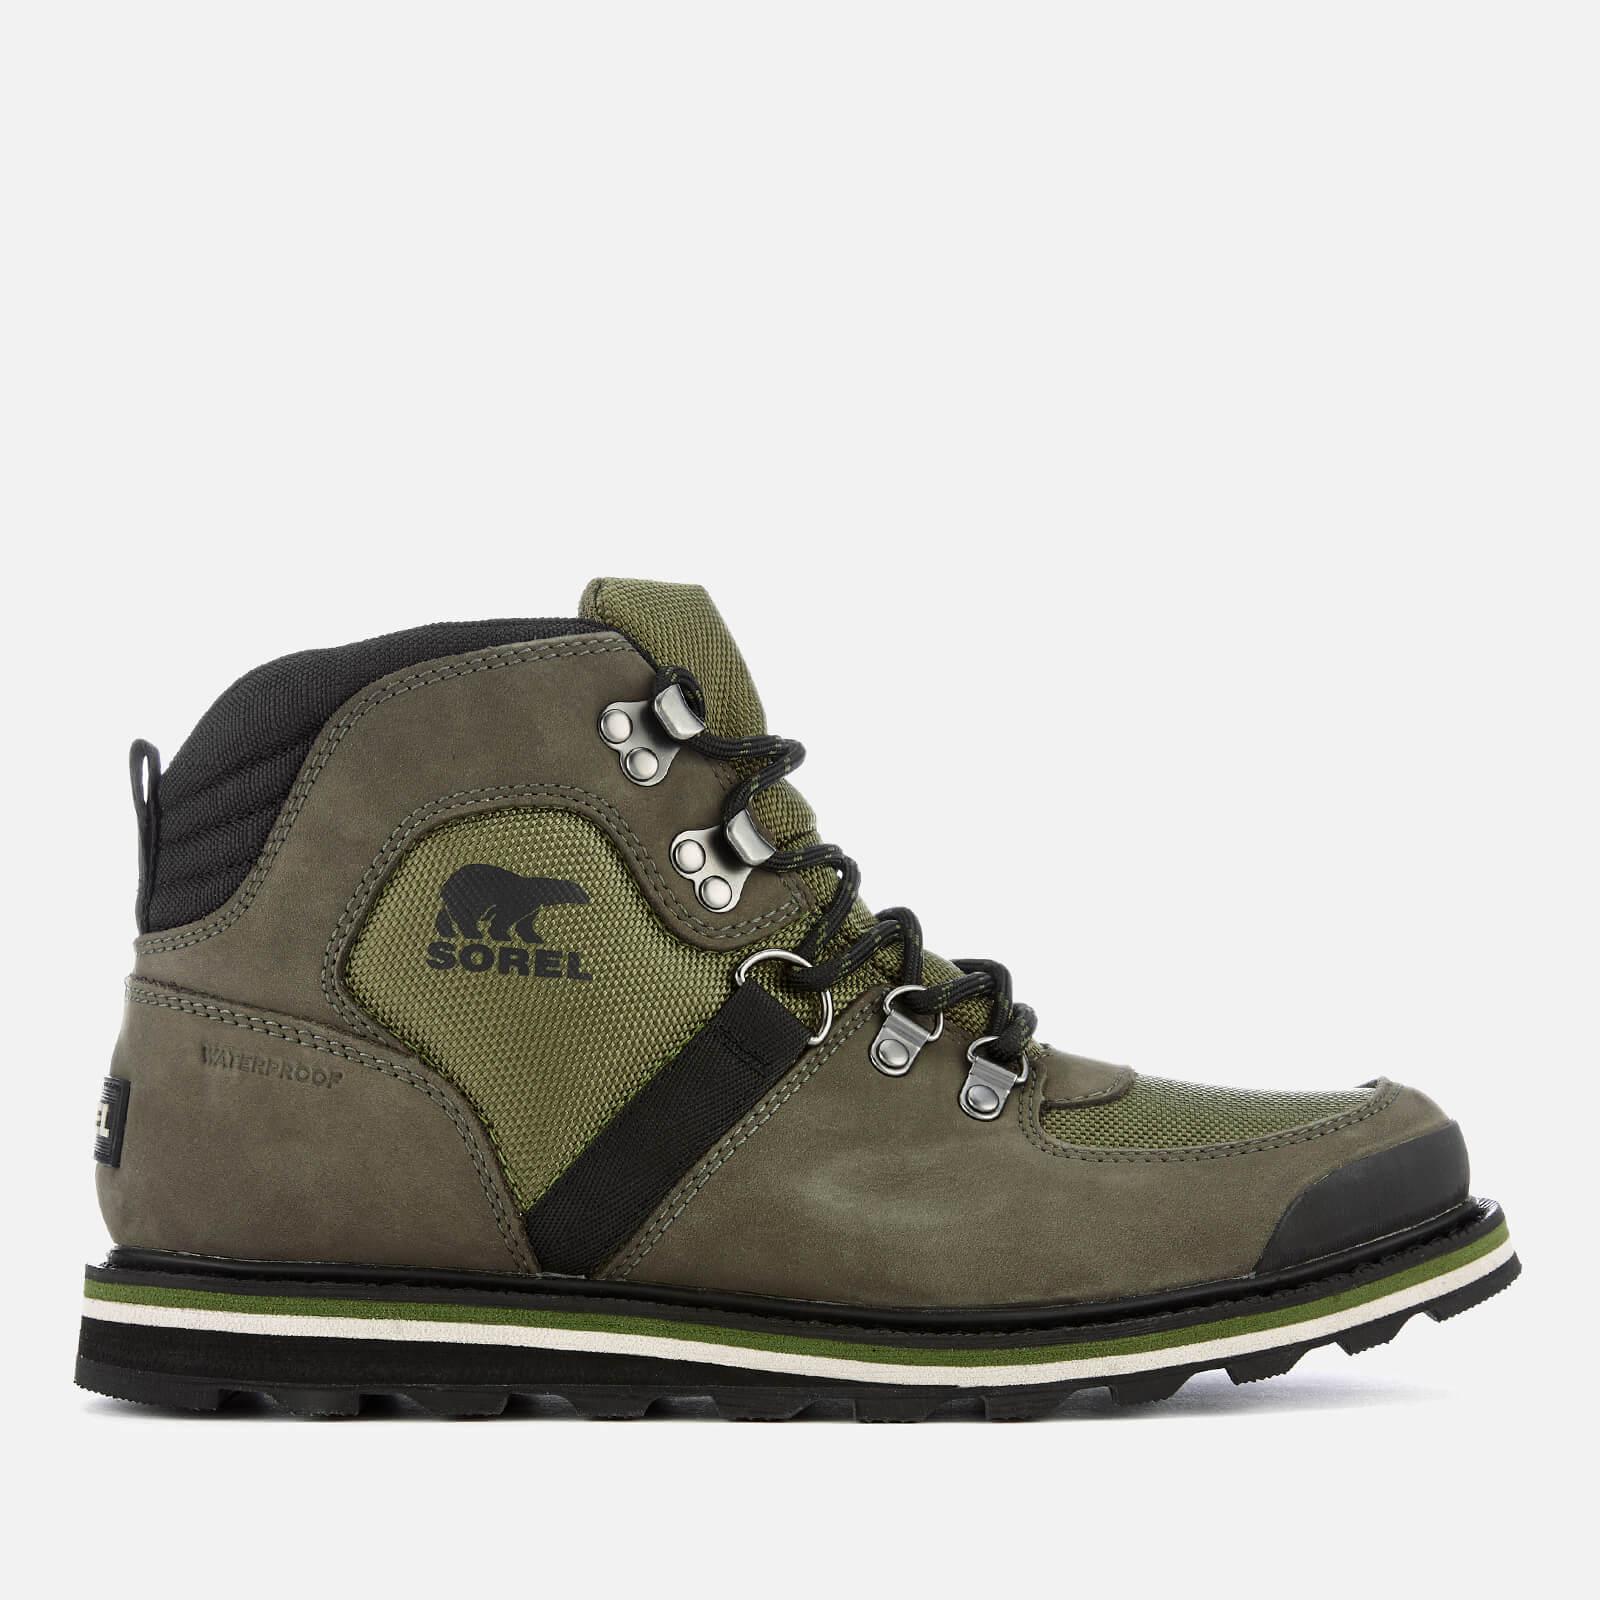 Sorel Men's Madson Sport Hiker Style Boots - Hiker Green - UK 10